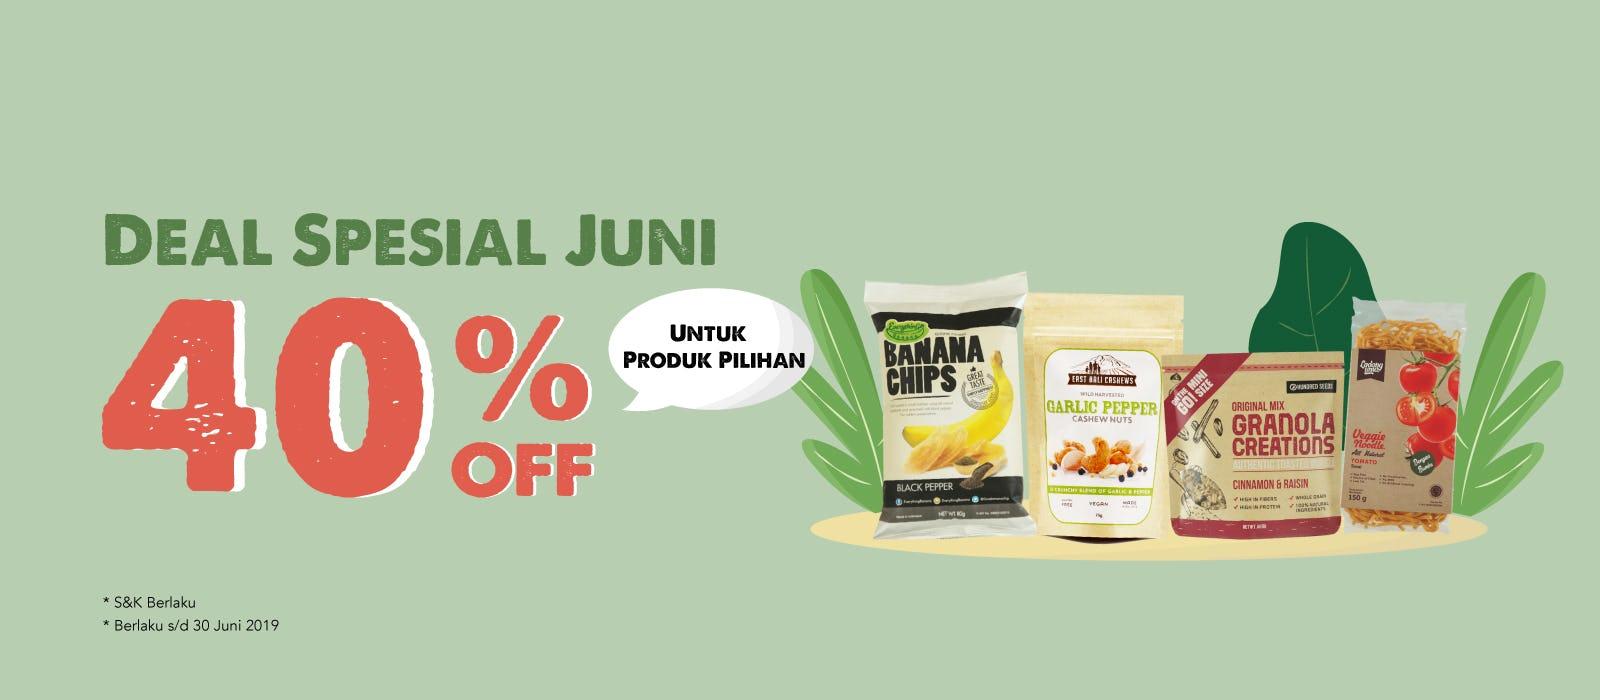 Deal Spesial Juni 40% OFF